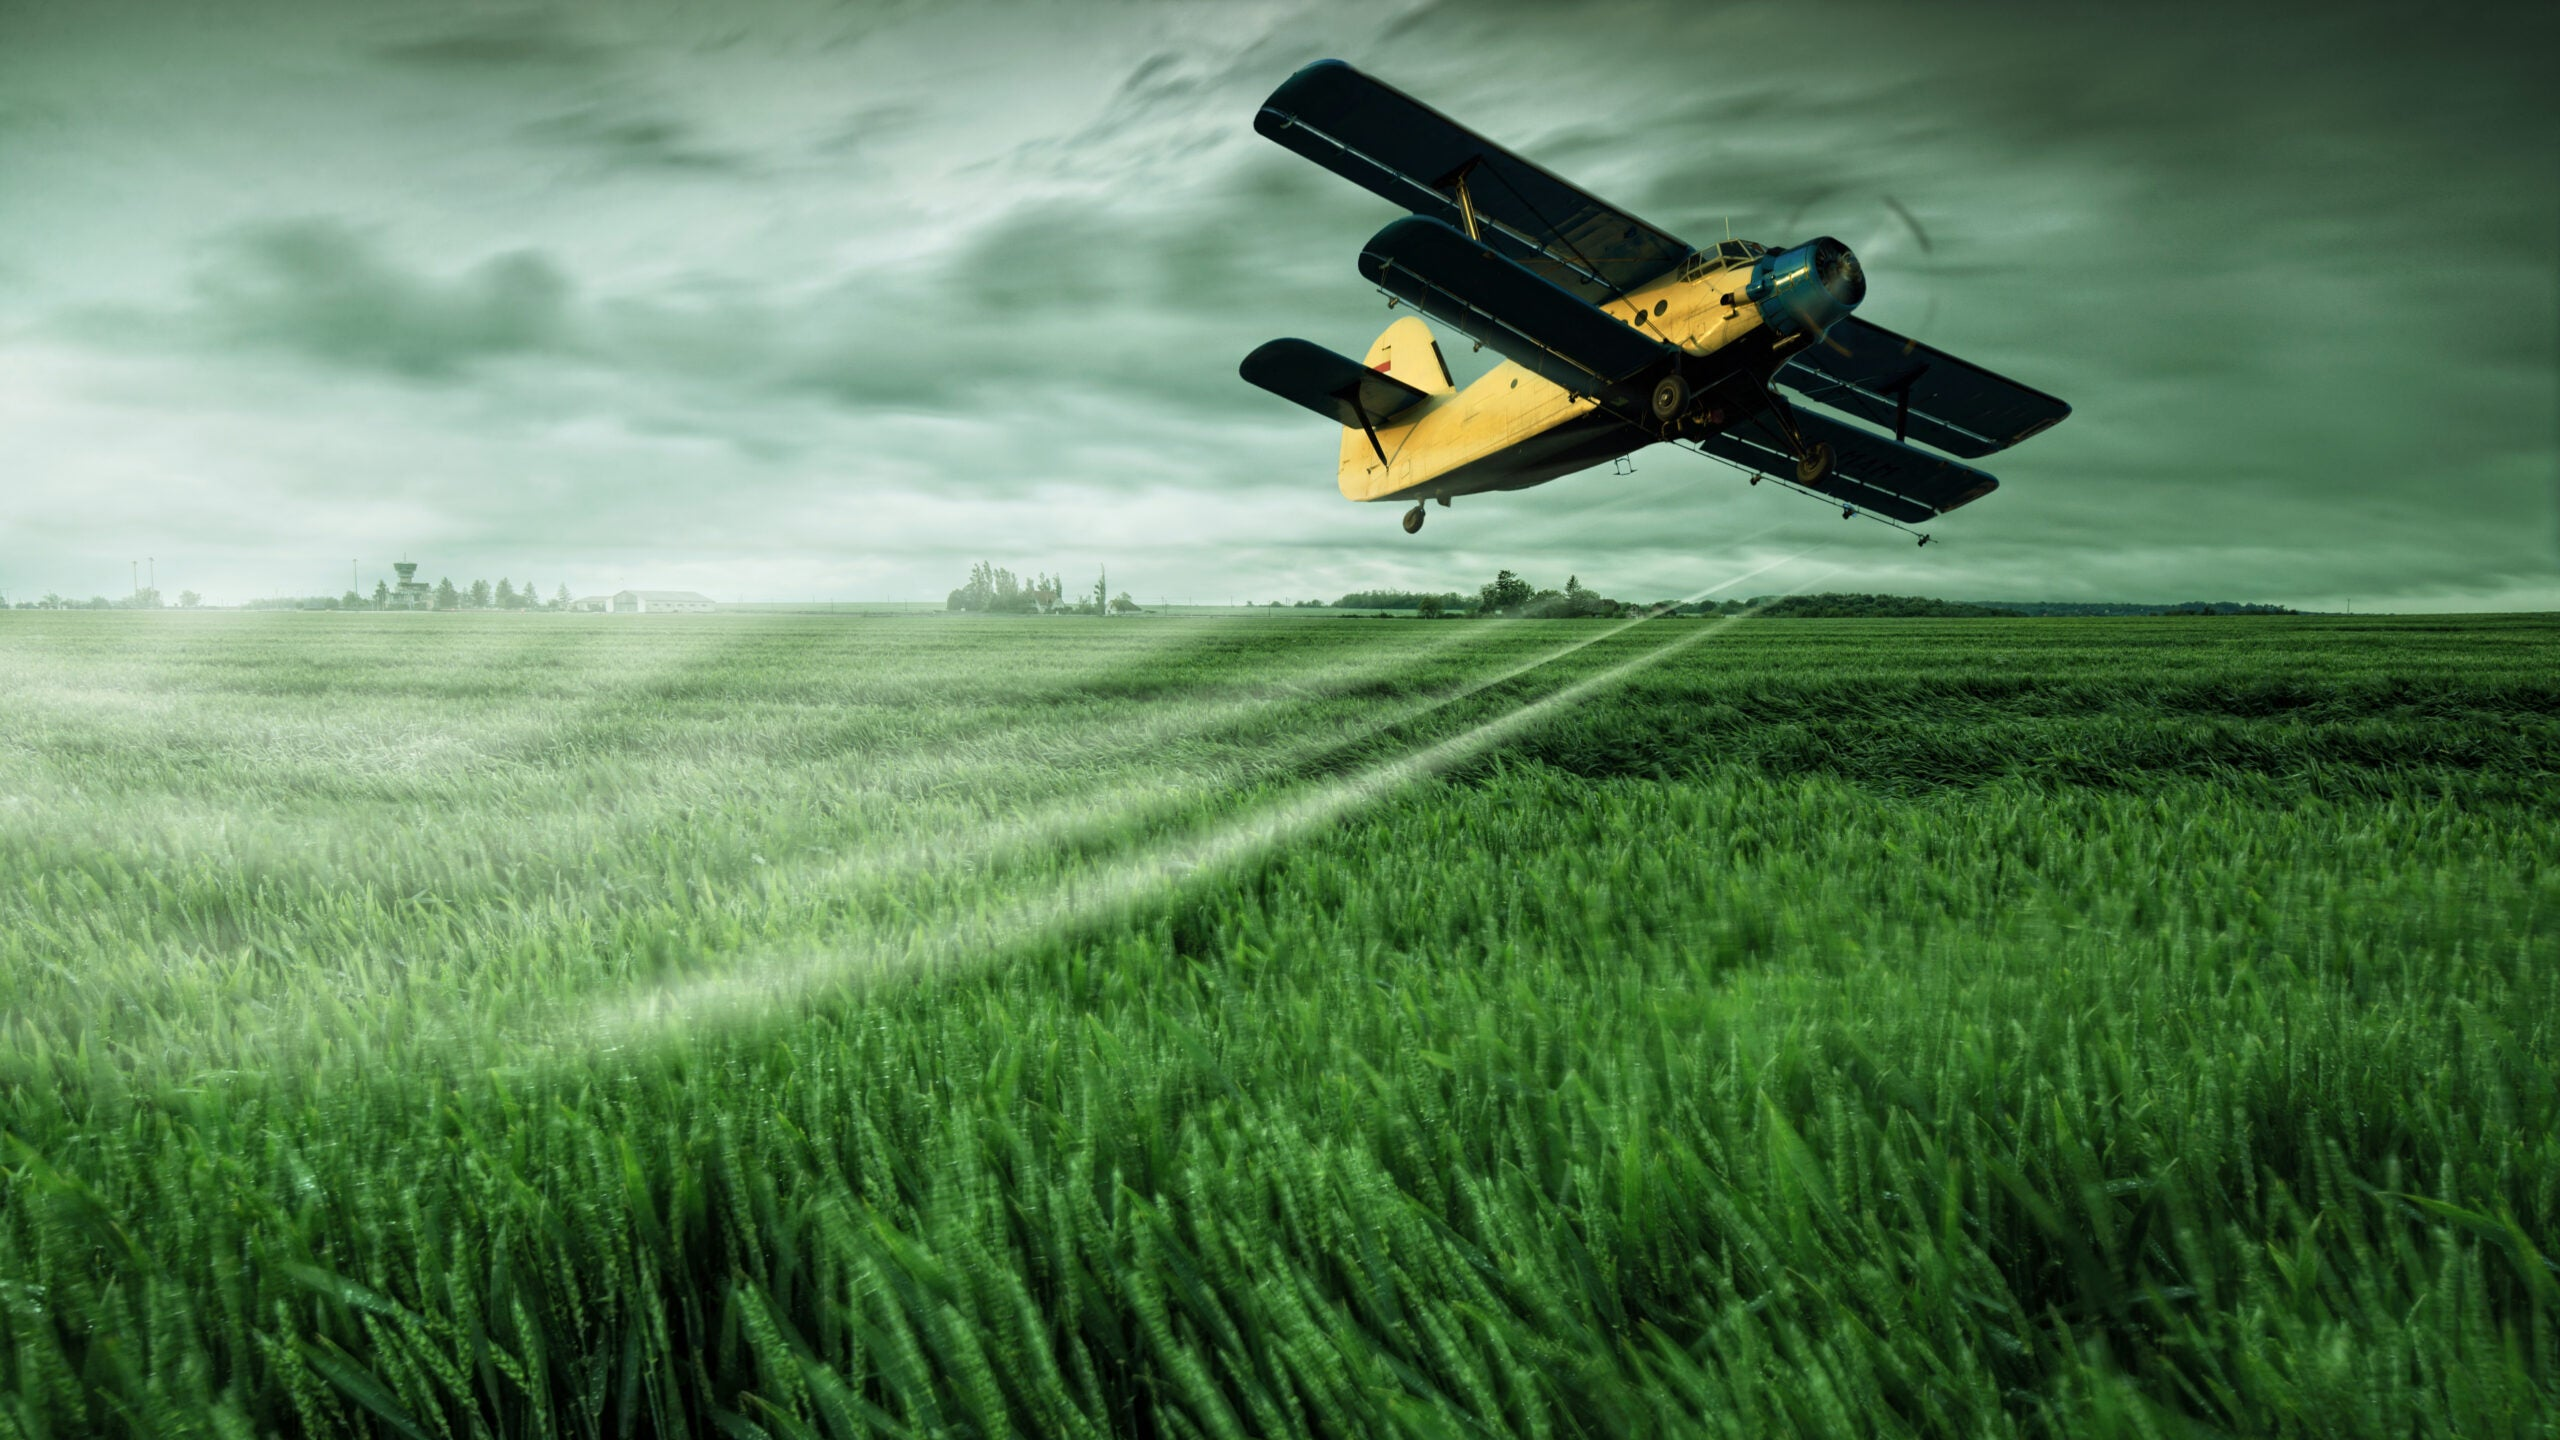 A plane sprays a field with pesticides.